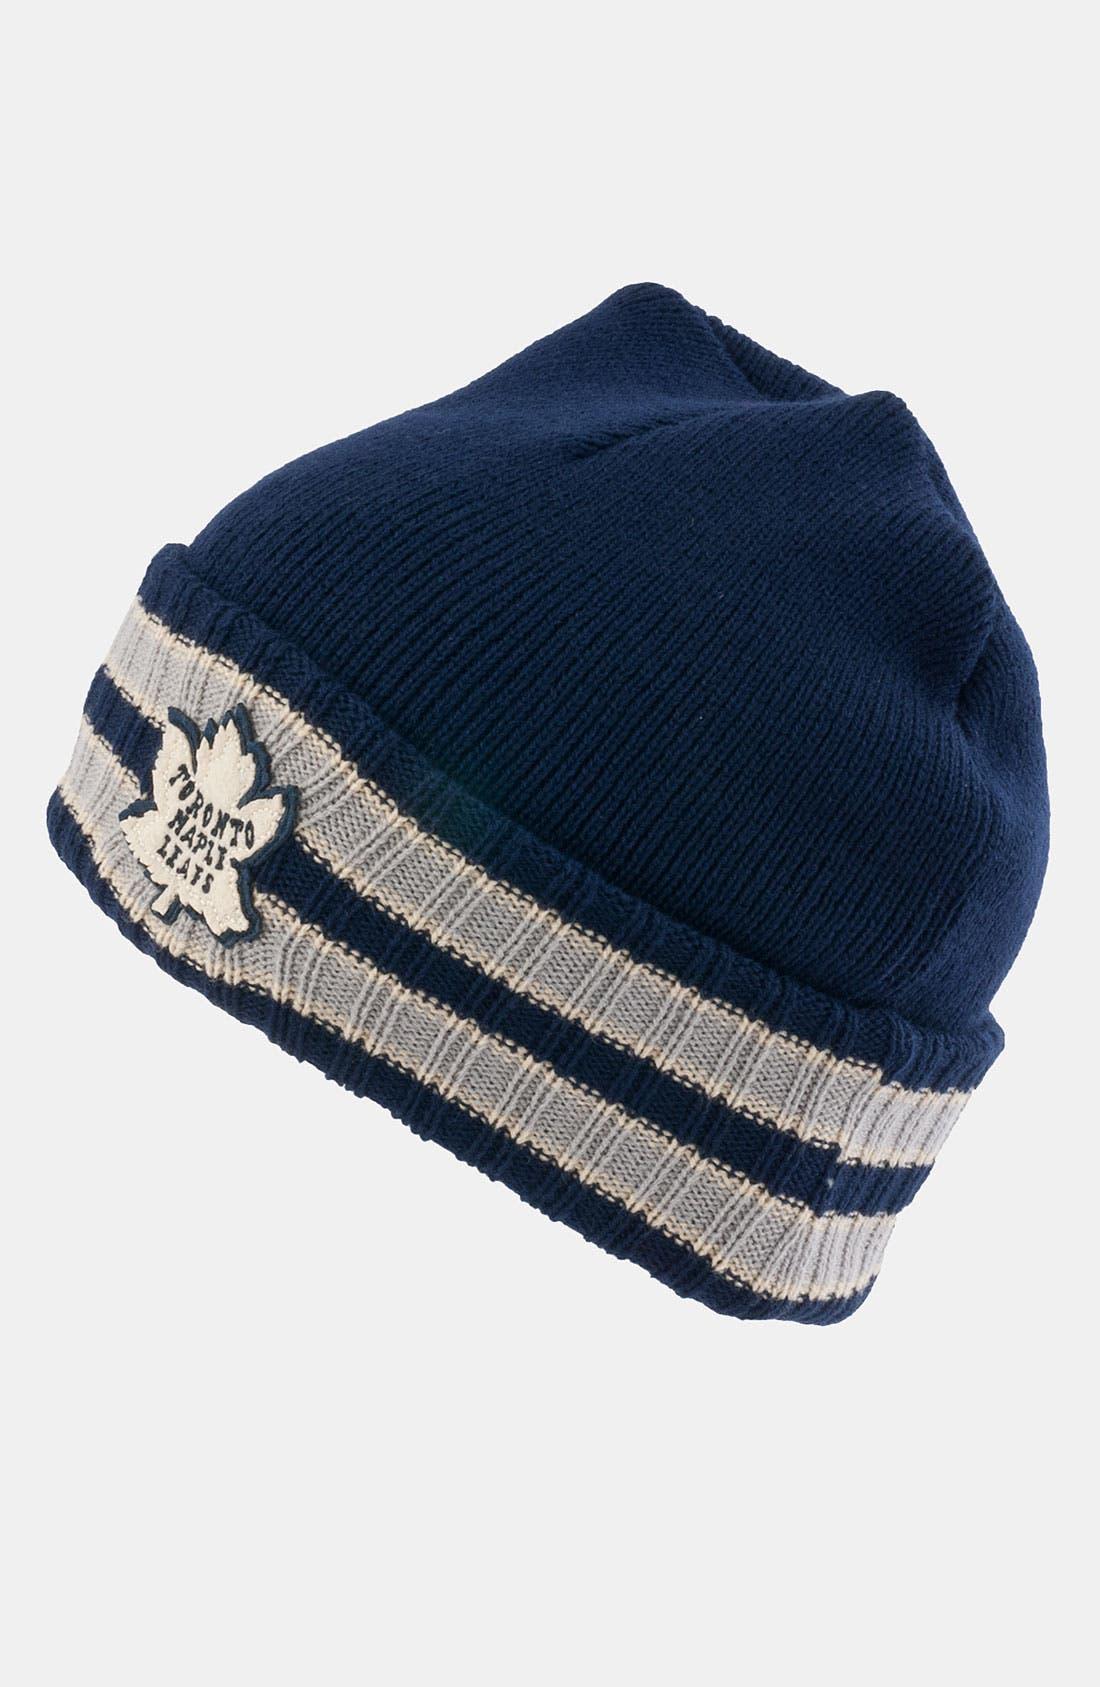 Alternate Image 1 Selected - American Needle 'Toronto Maple Leafs - Slash' Knit Hat